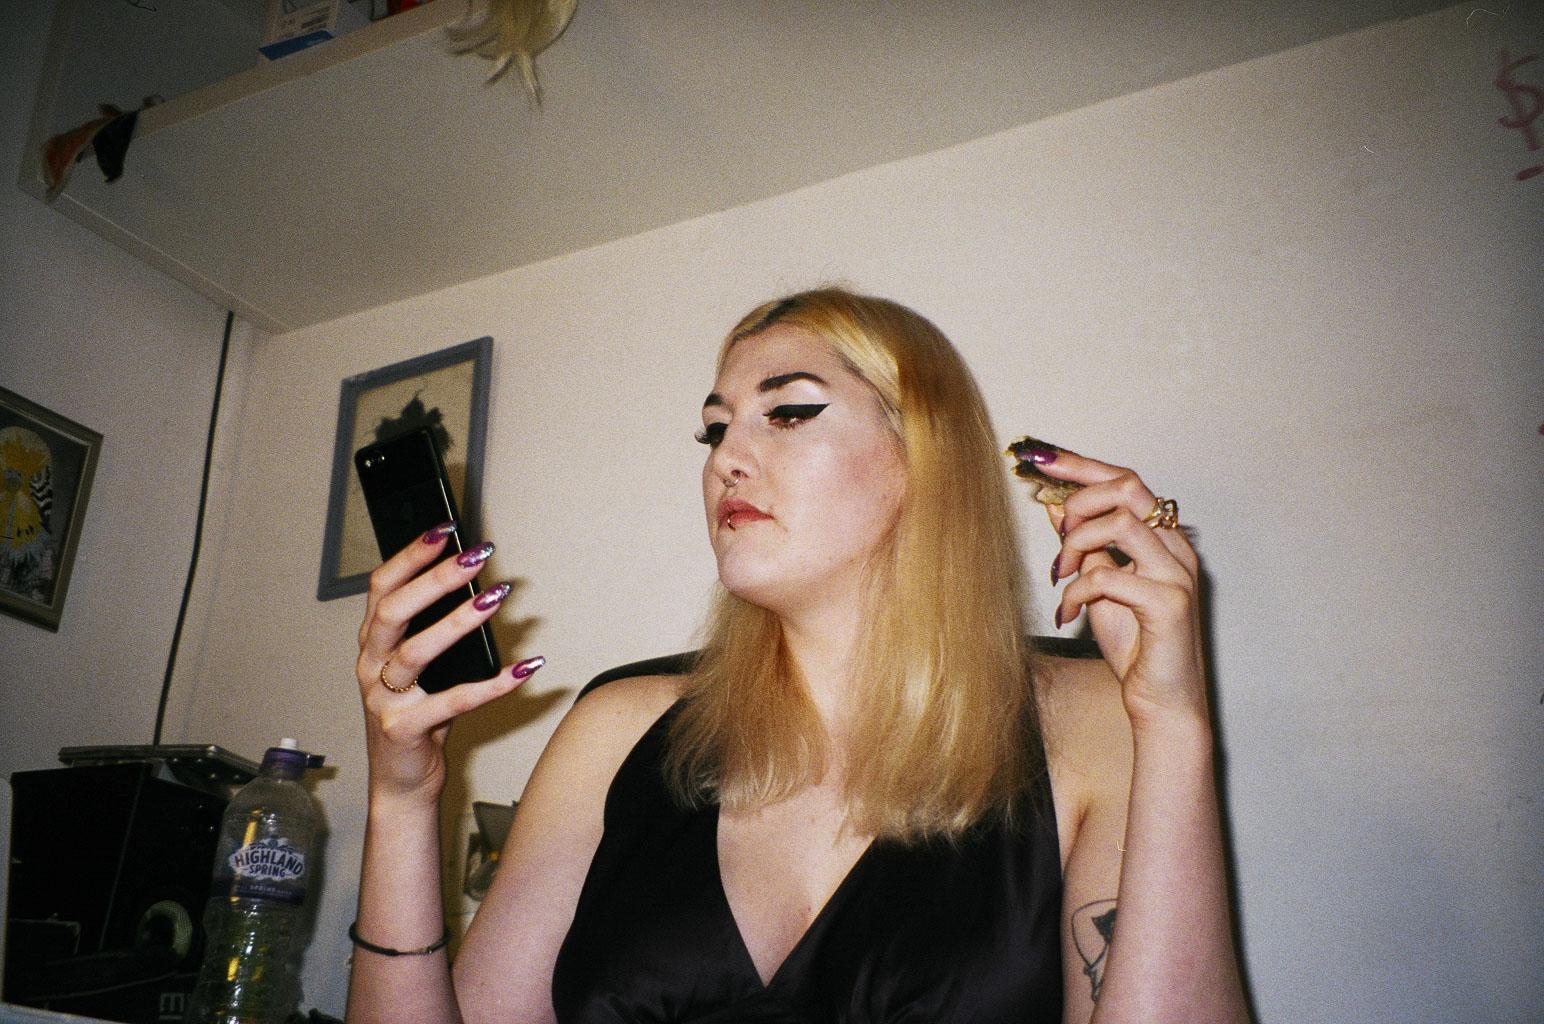 matrimoniale telefonic